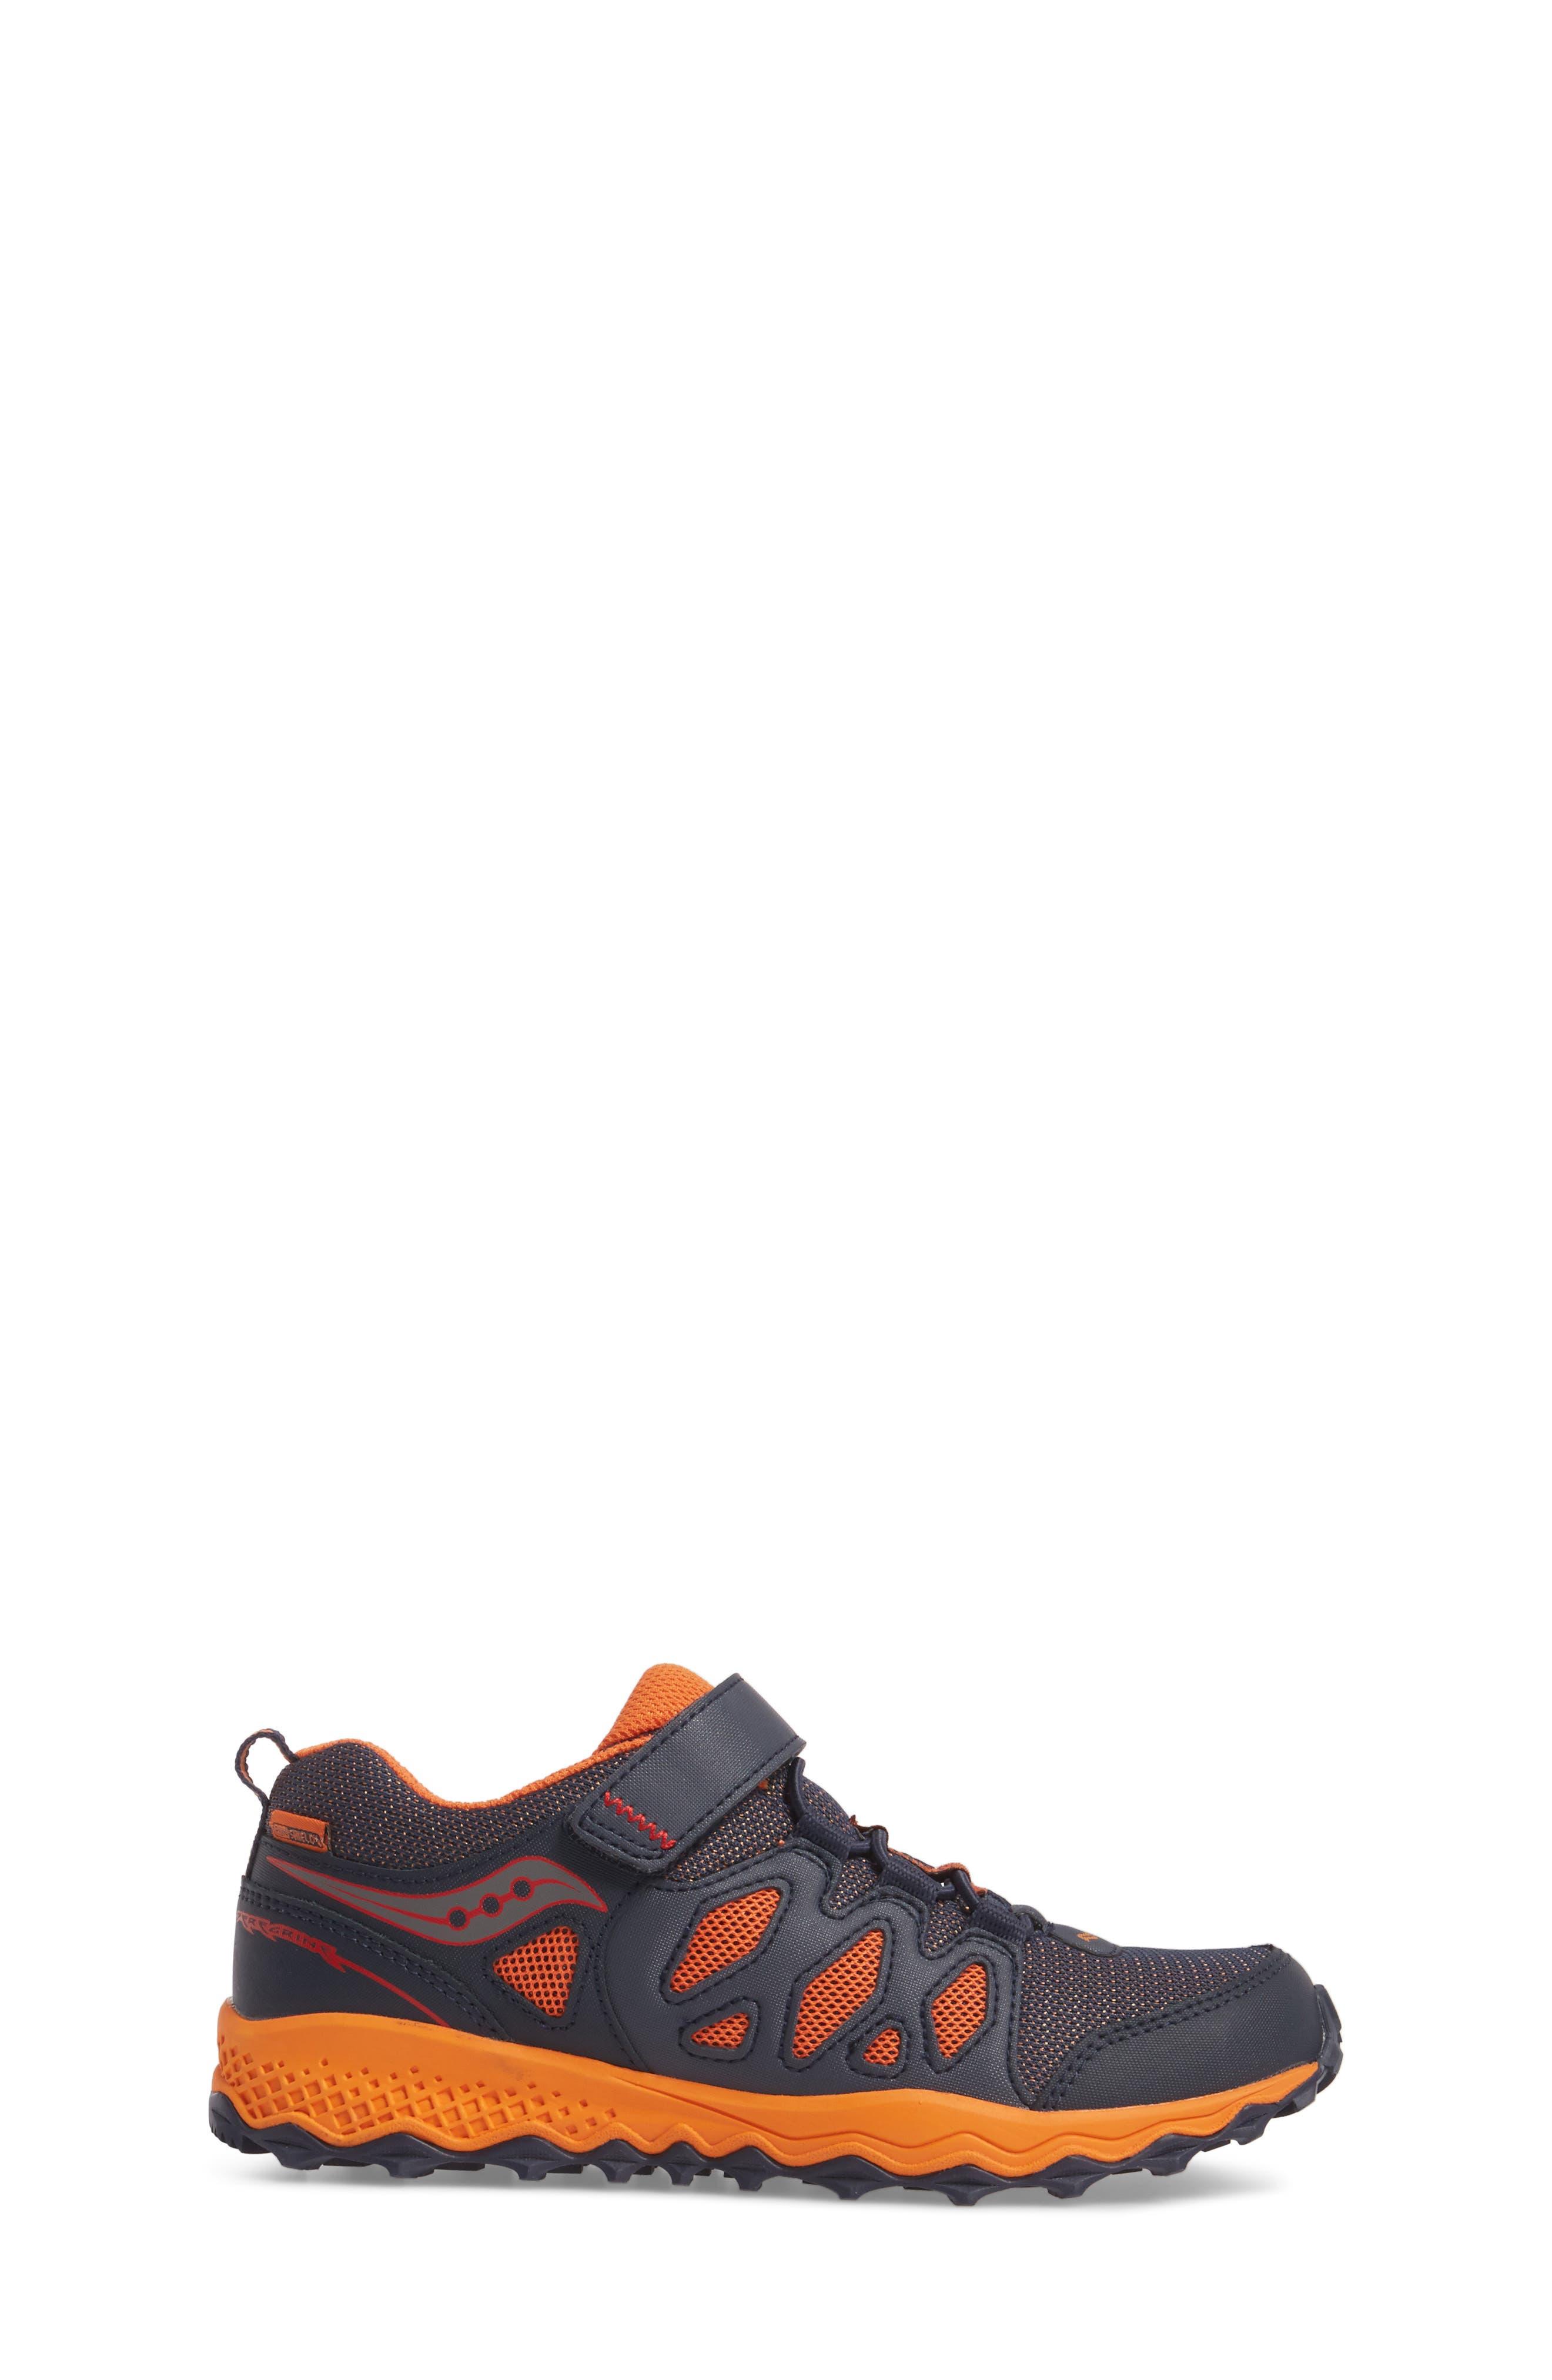 Peregrine Shield Water-Resistant Sneaker,                             Alternate thumbnail 3, color,                             Navy/ Orange